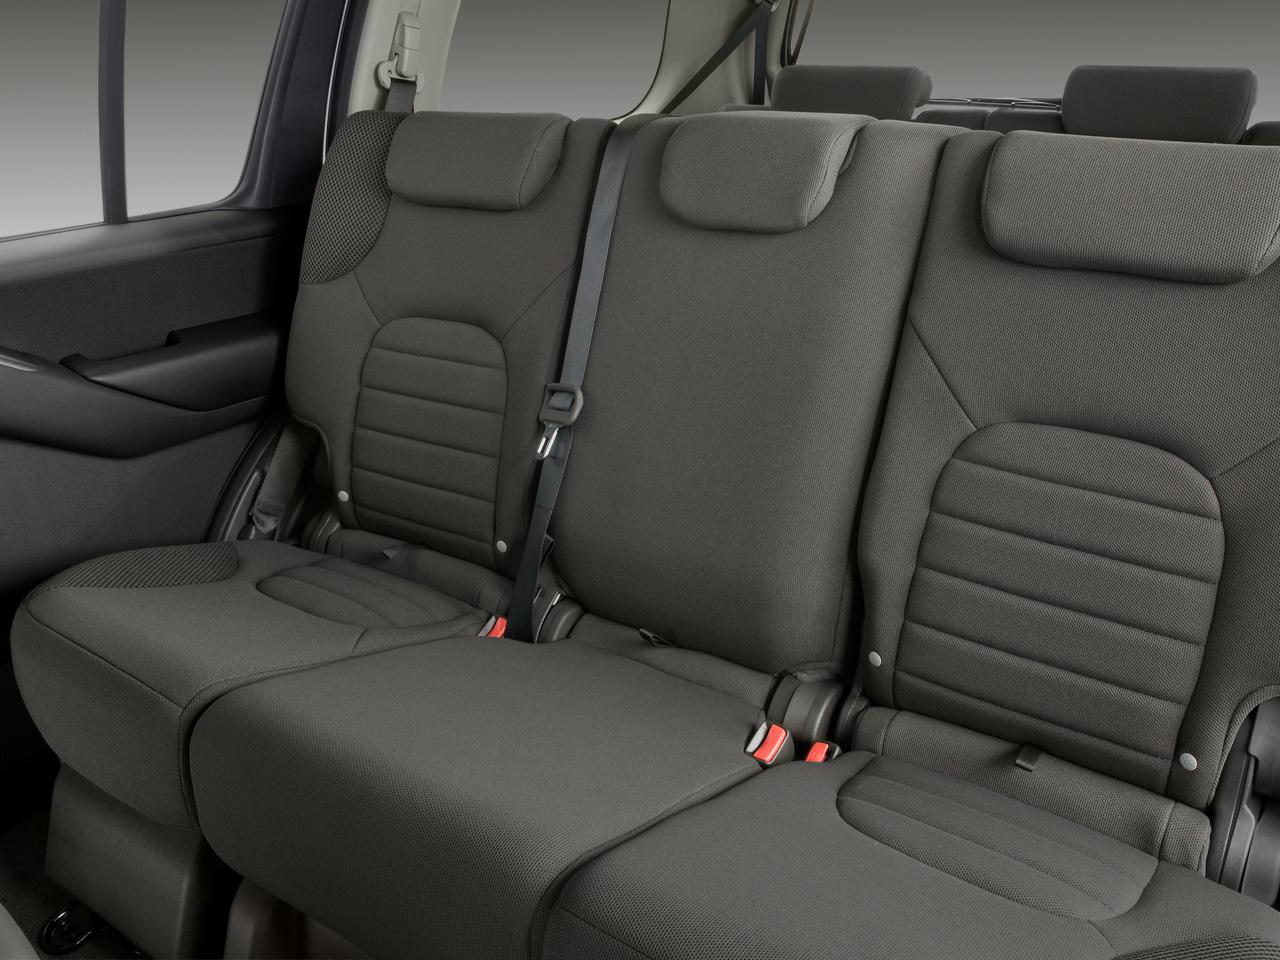 2008 Nissan Pathfinder SE - Nissan Midsize SUV Review - Automobile